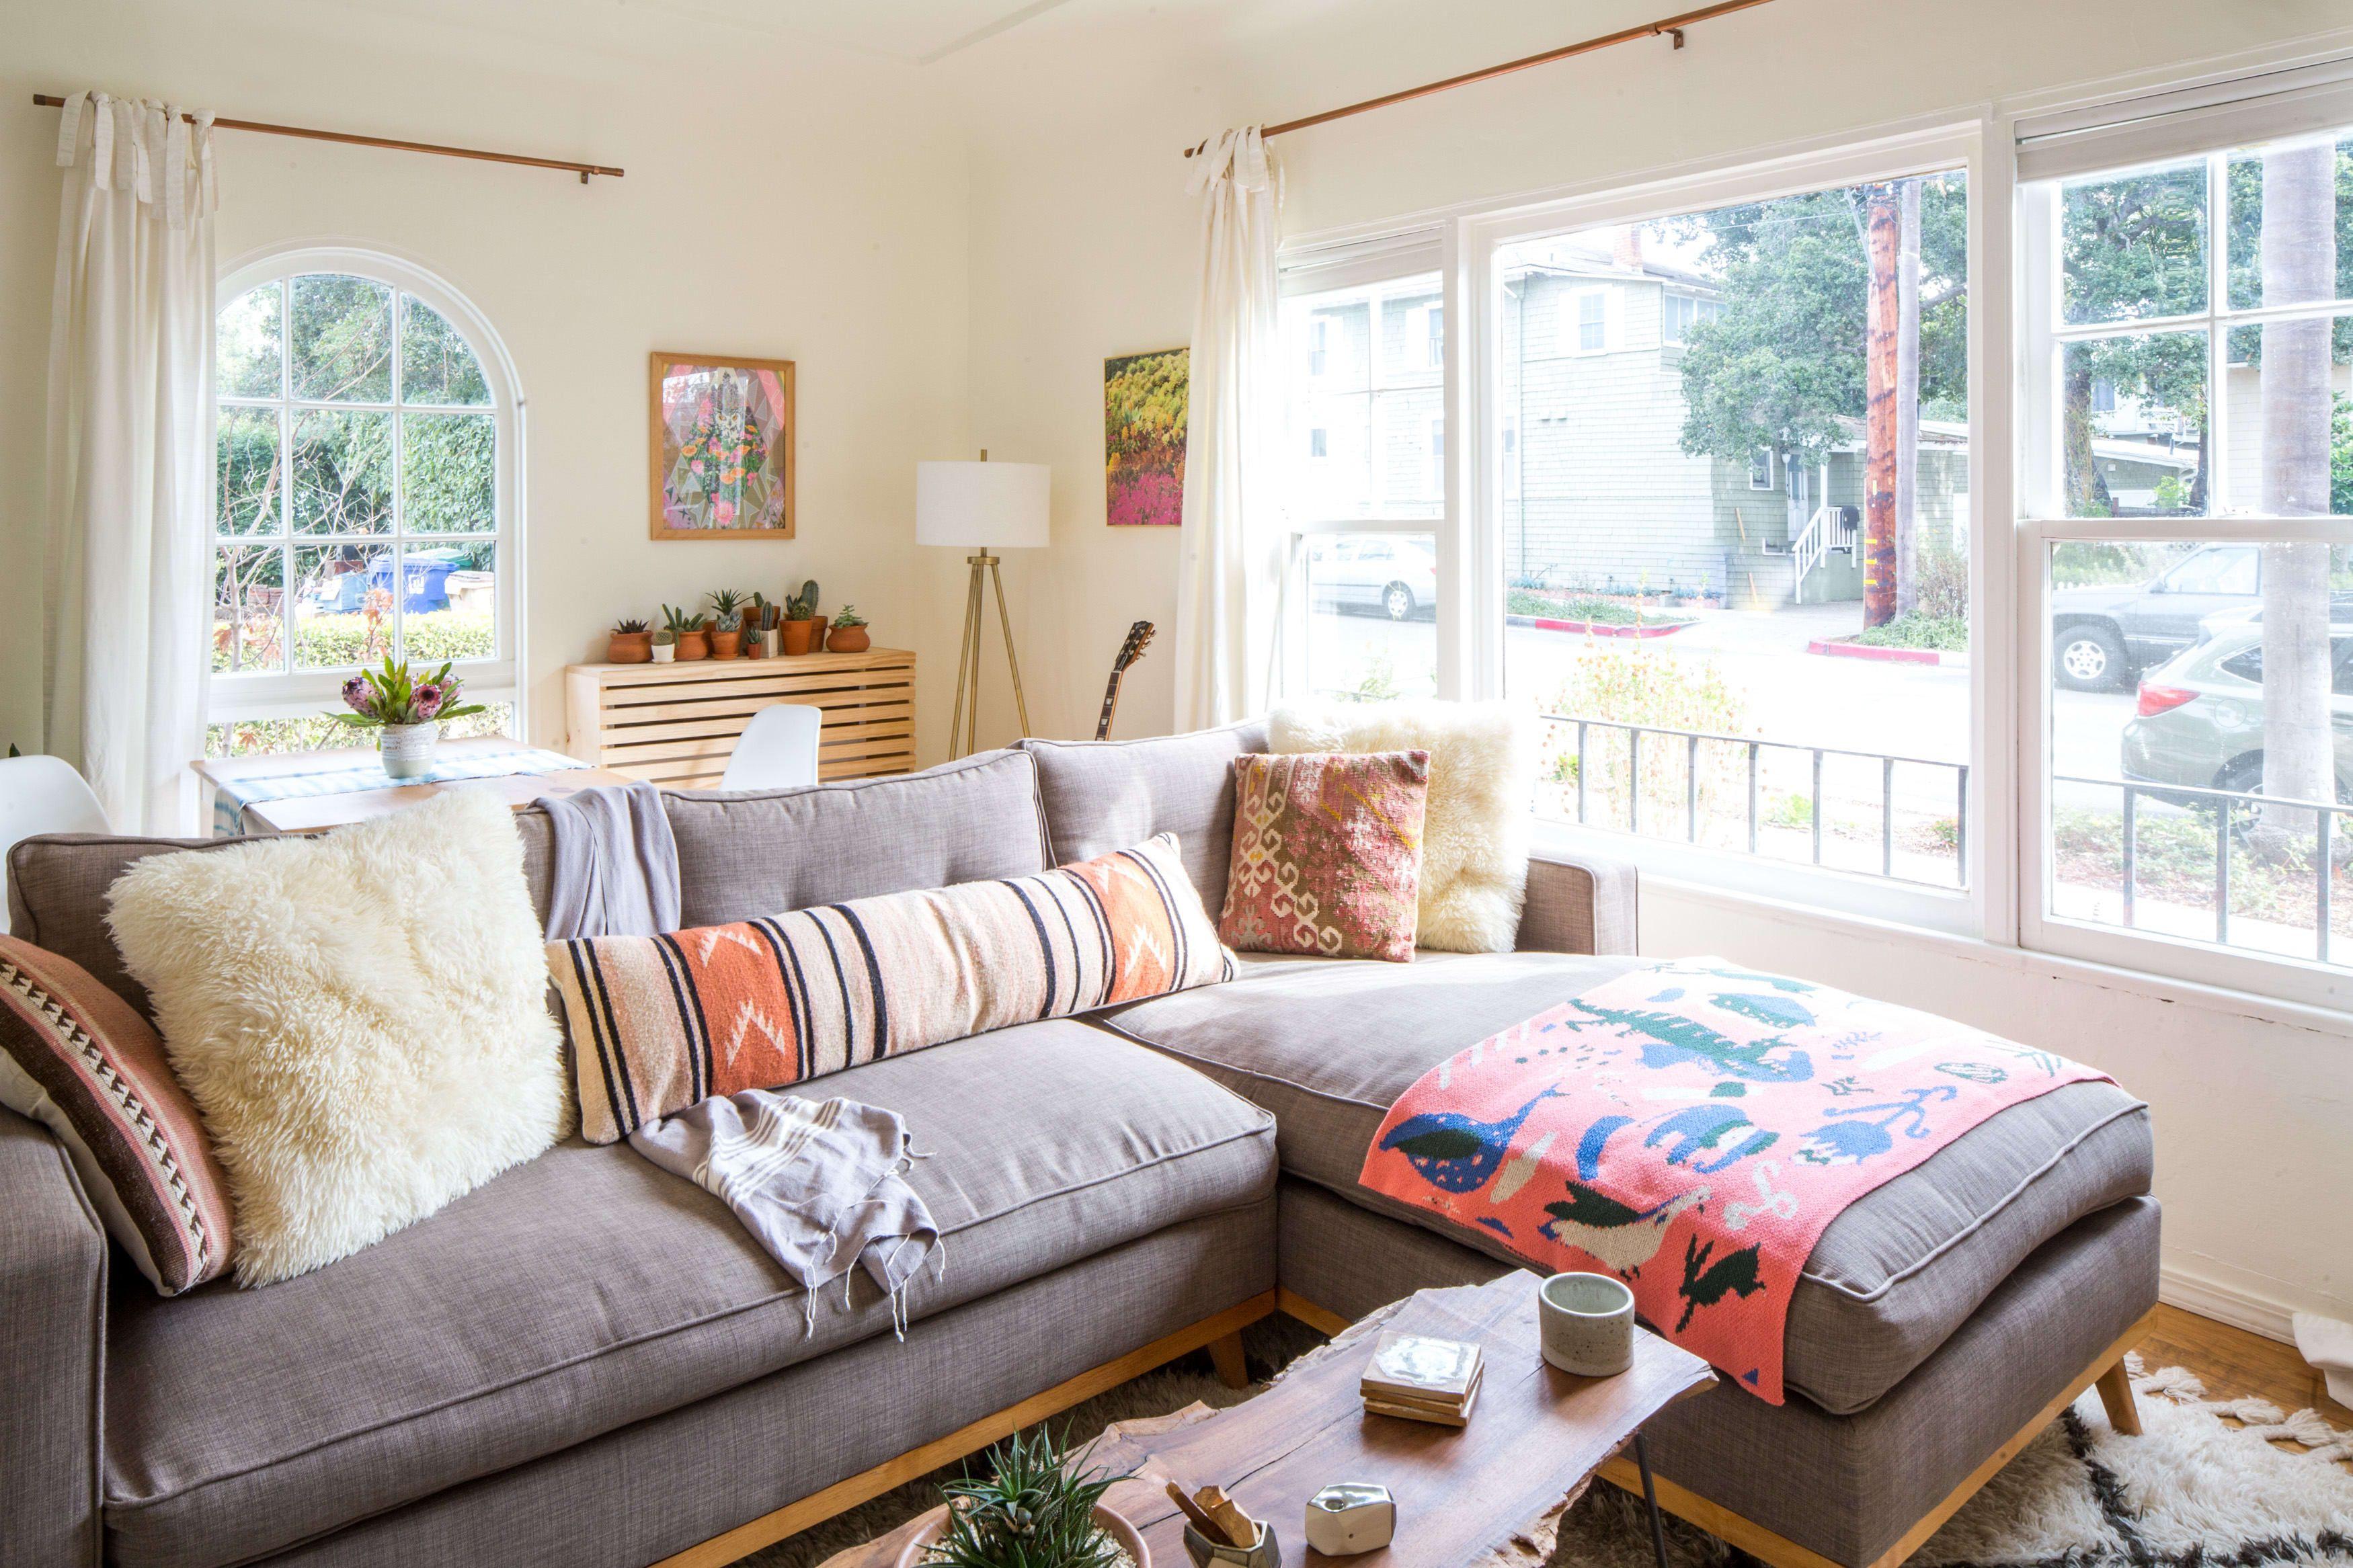 A Boho Minimal Rental In Santa Barbara With Images Cheap Living Room Furniture Cheap Living Room Sets Living Room Furniture